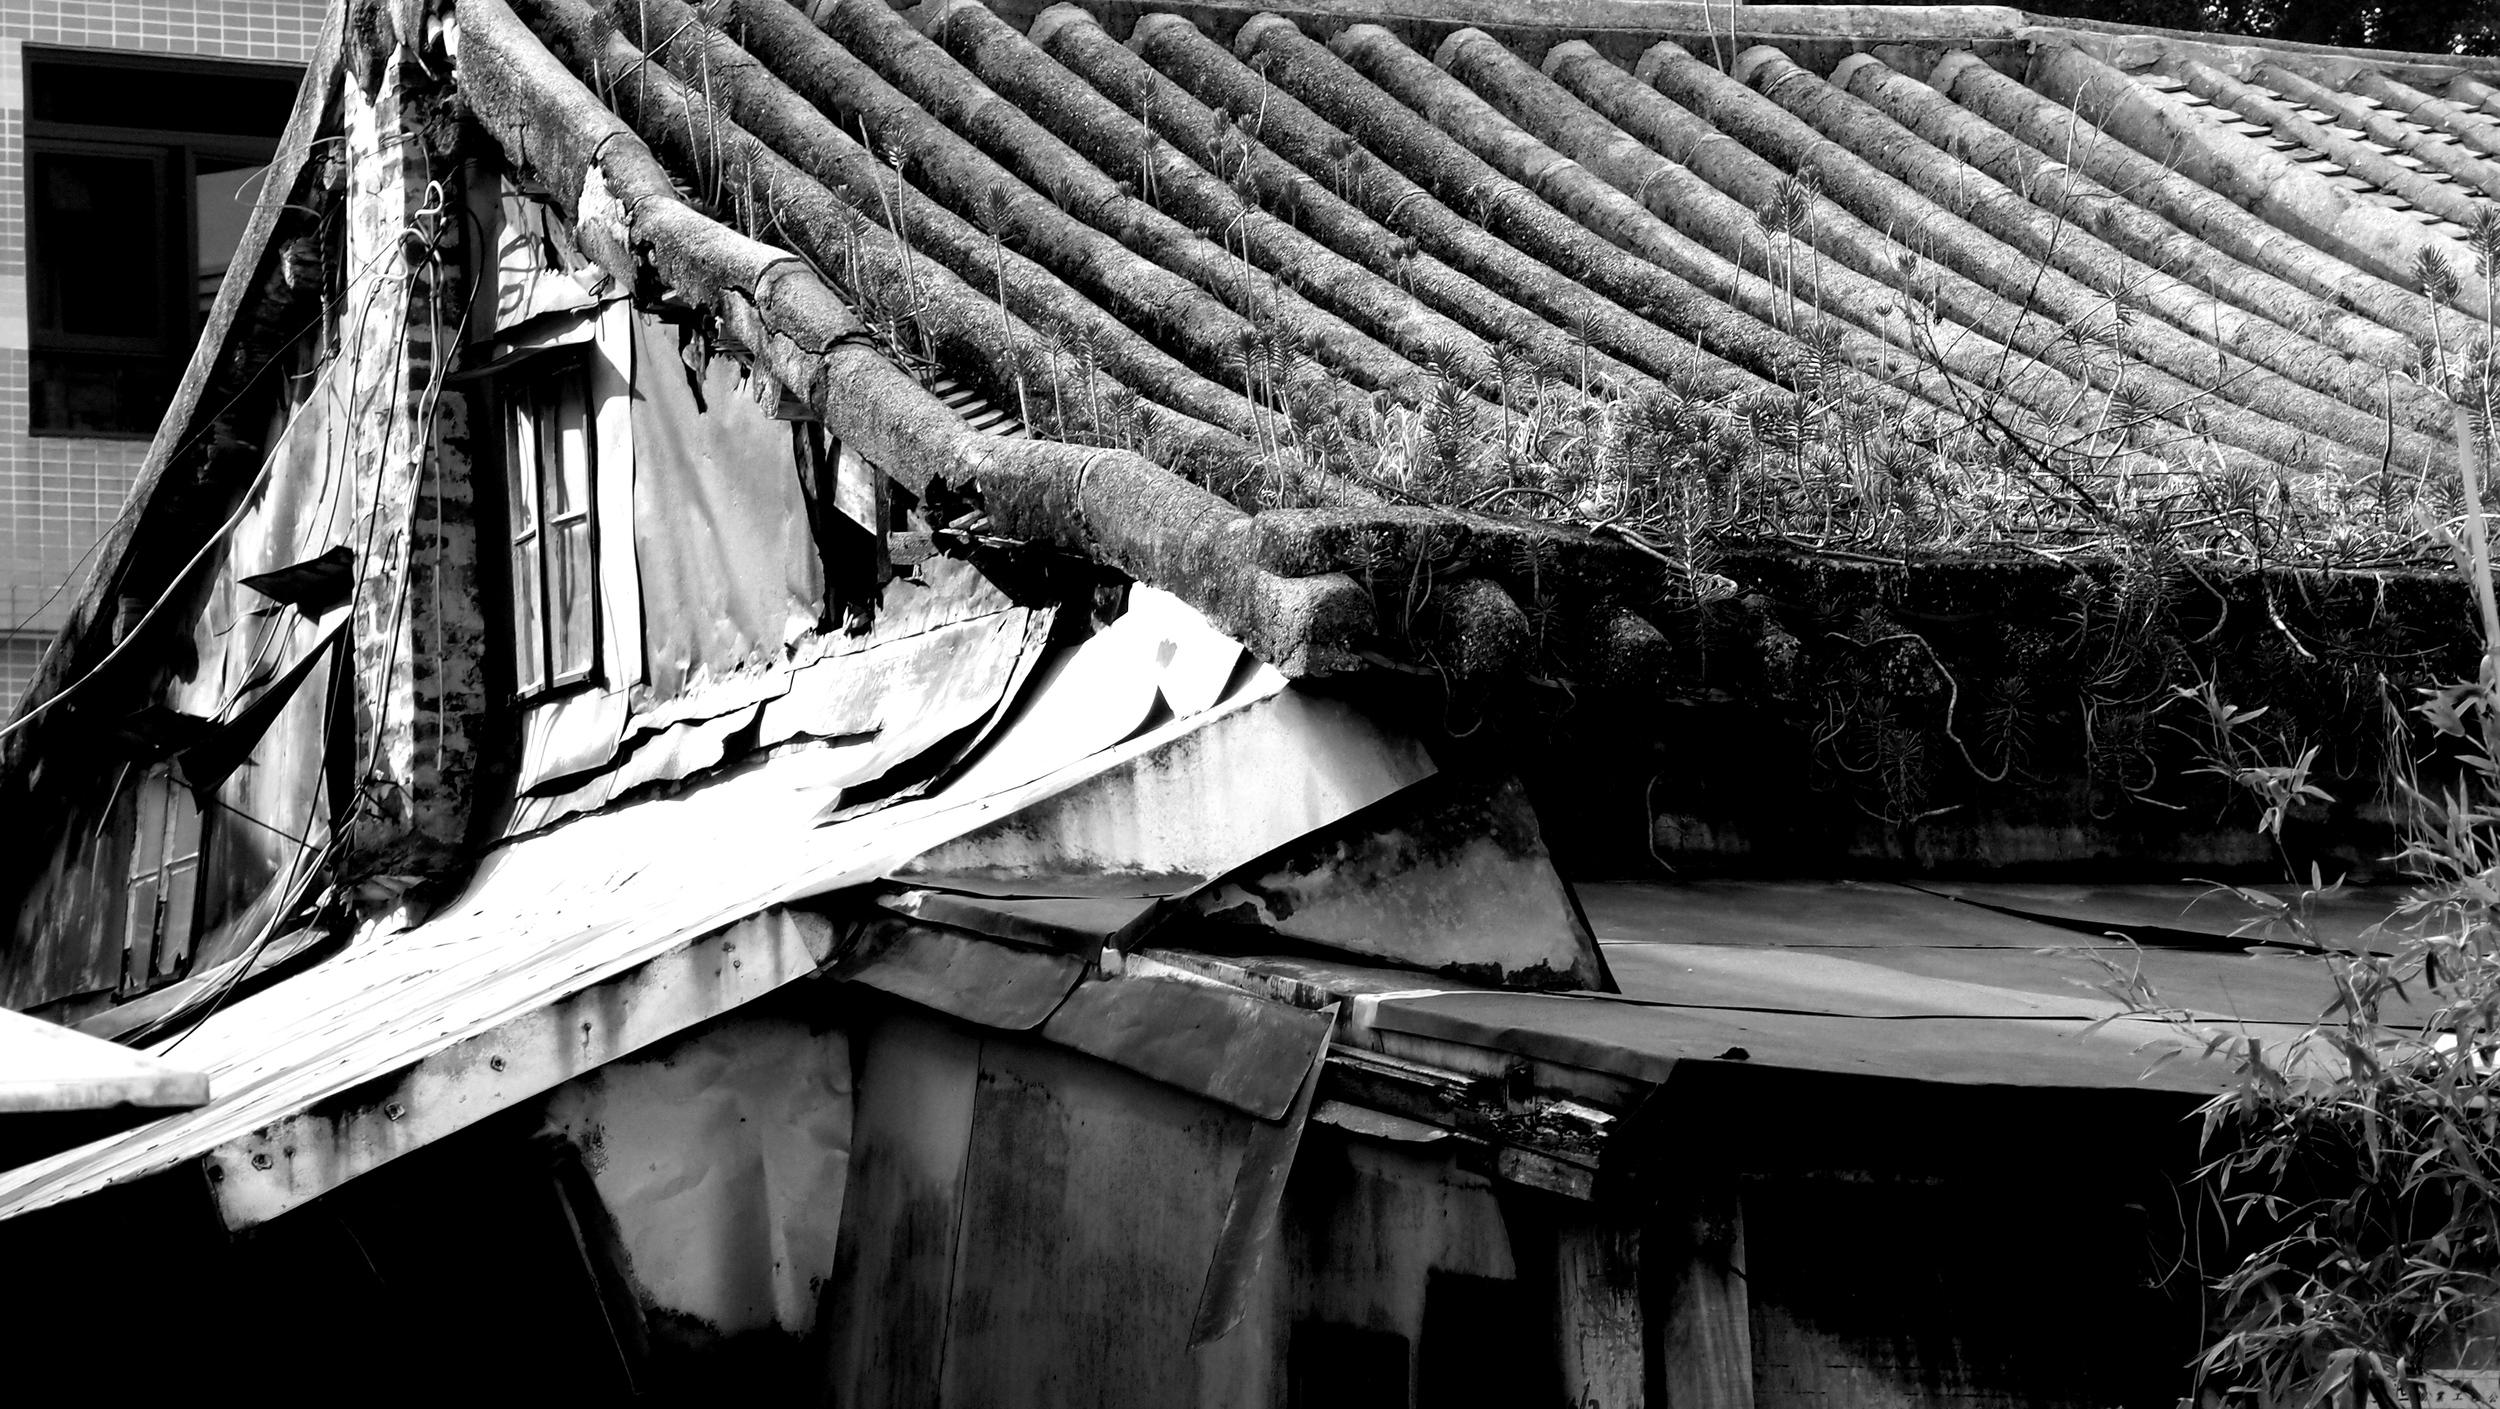 An old building at the Tai O Fishing Village on Lantau Island